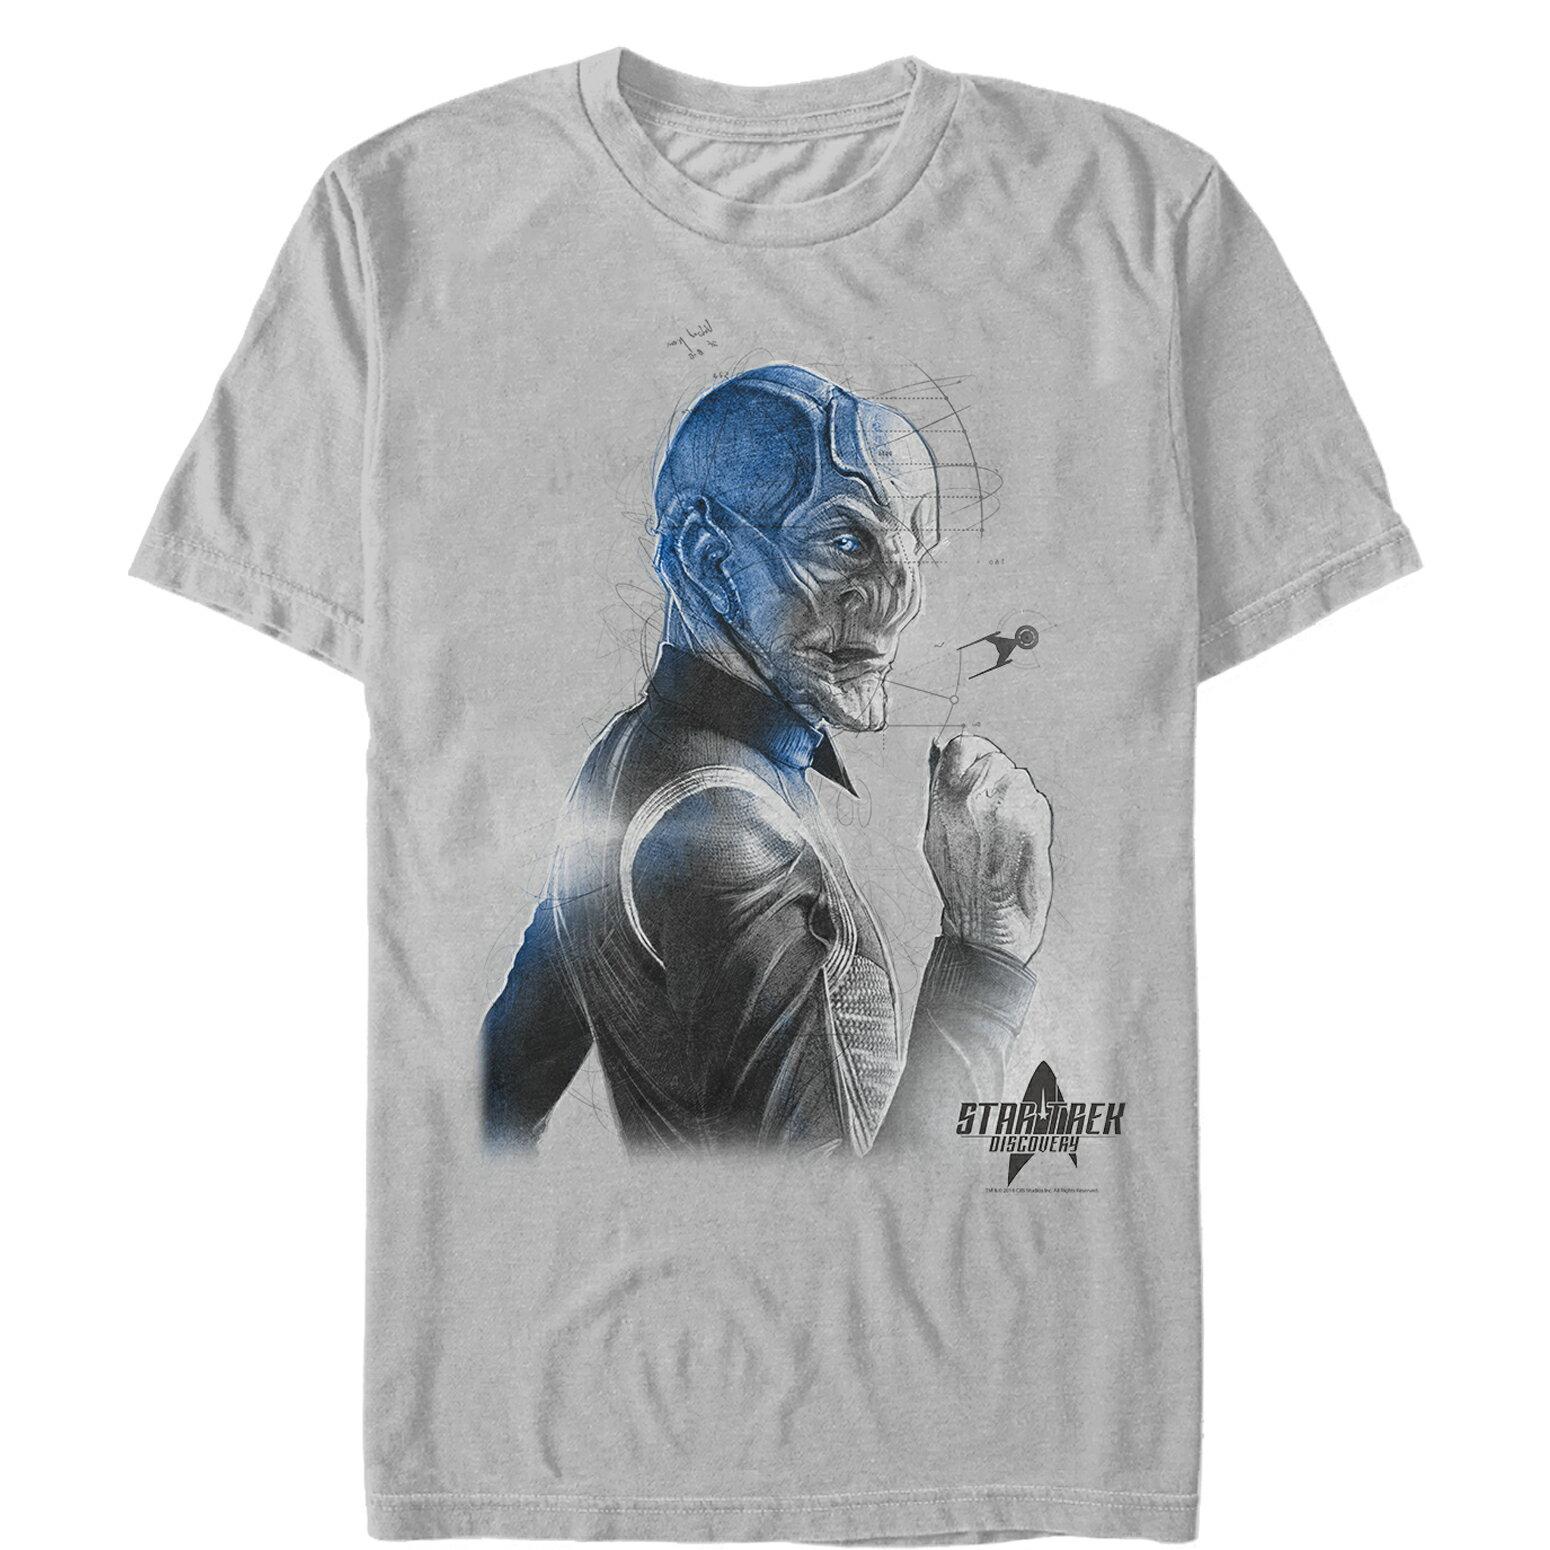 af43394df FifthSun: Star Trek Discovery Saru Details Mens Graphic T Shirt ...